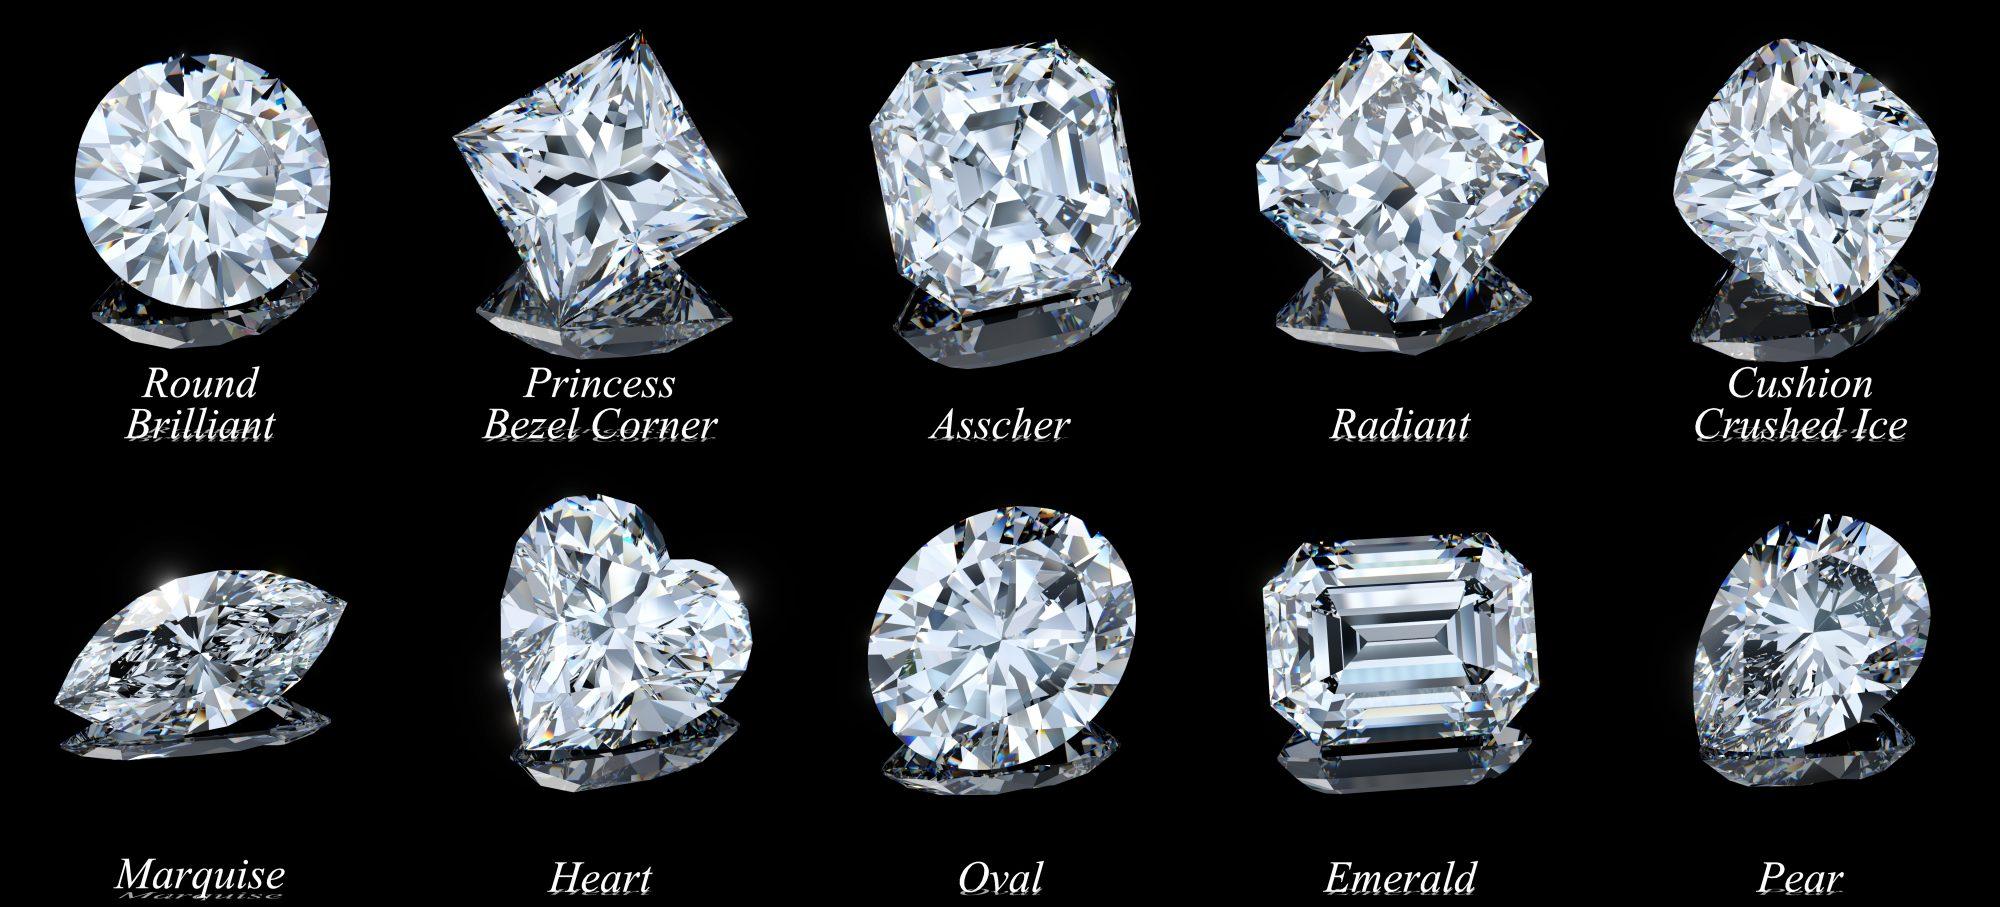 diamond cut examples chart